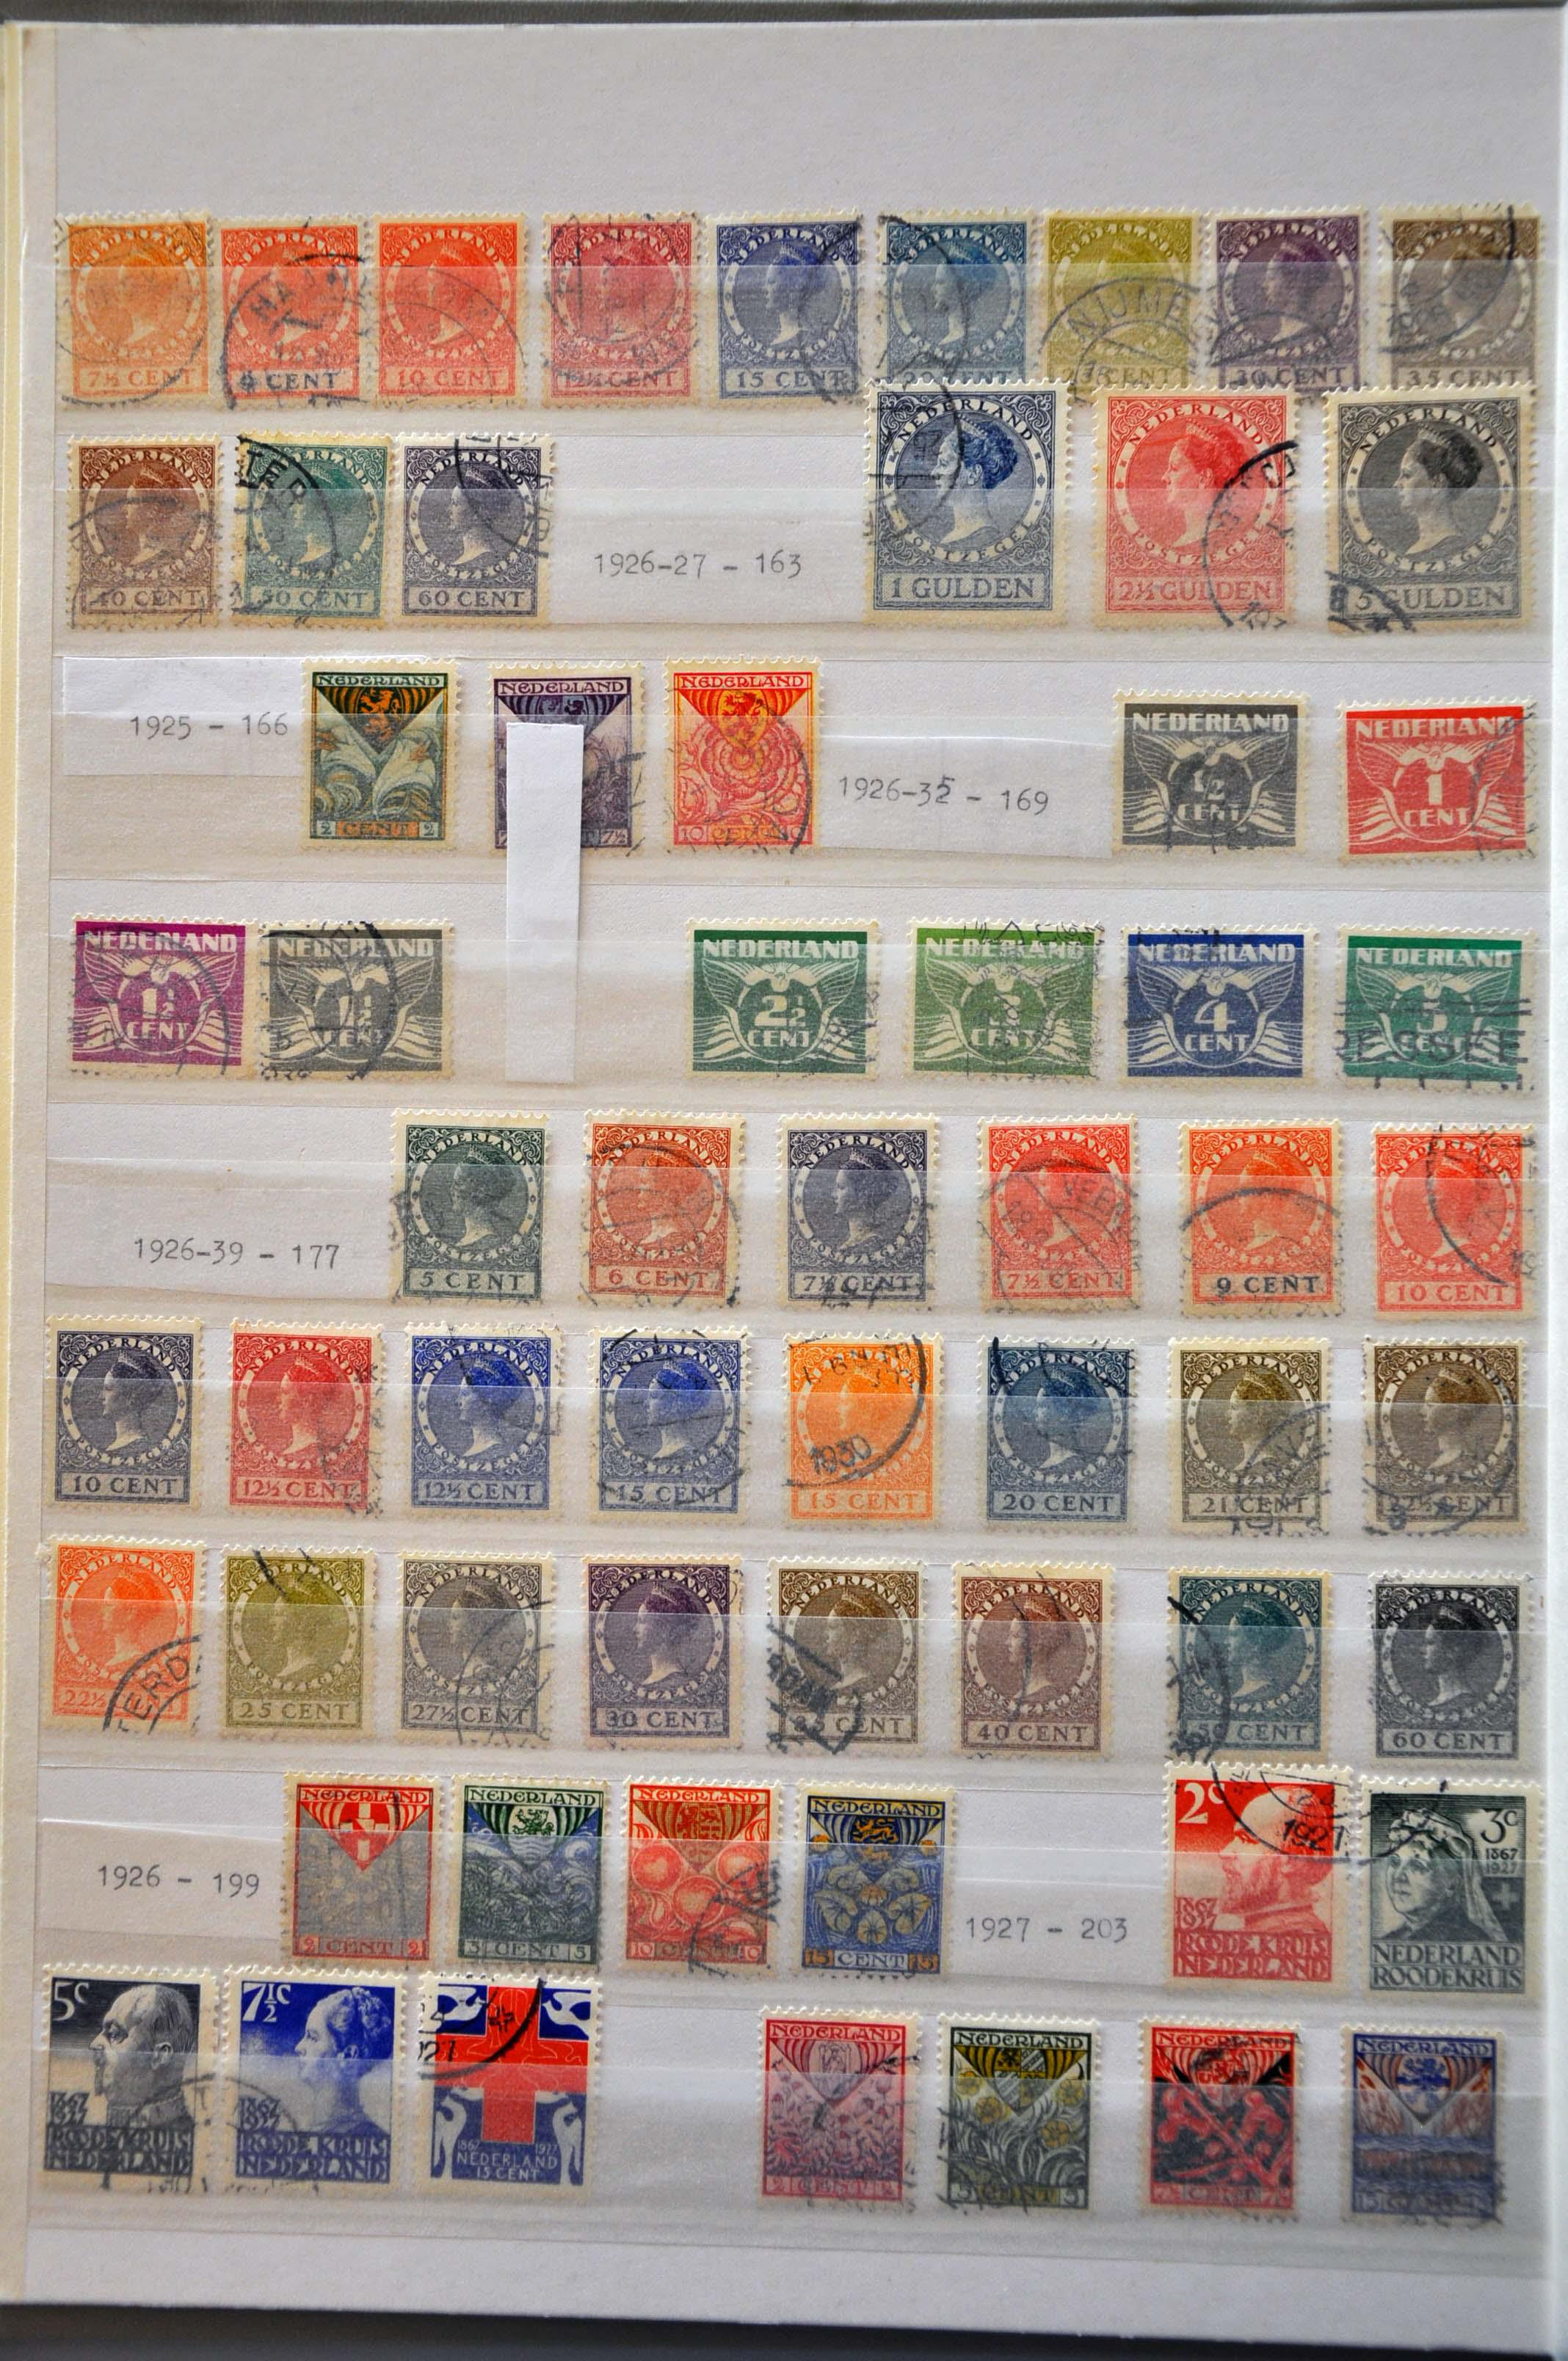 Lot 1572 - Netherlands and former colonies Netherlands -  Corinphila Veilingen Auction 237 Part 2: General sale